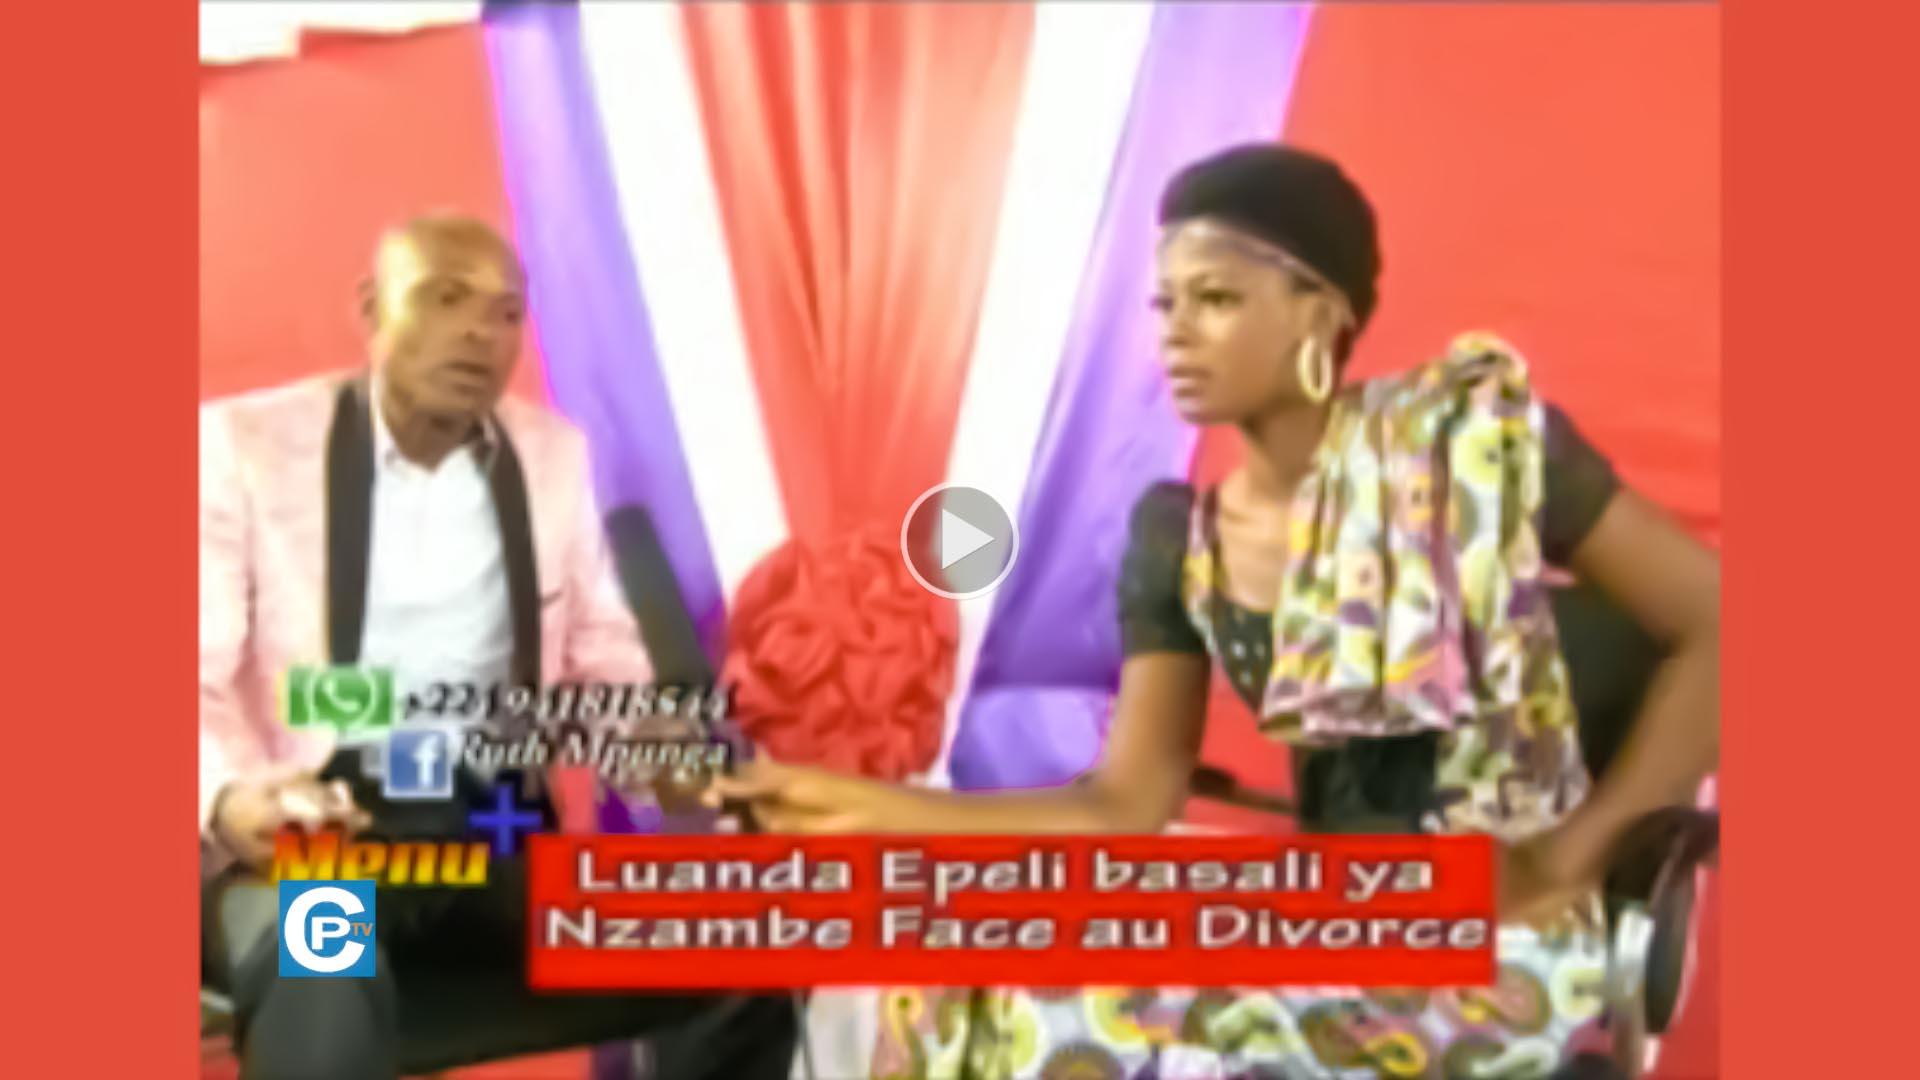 ANGOLA LUANDA EPELI BASALI YA NZAMBE FACE AUX DIVORCES